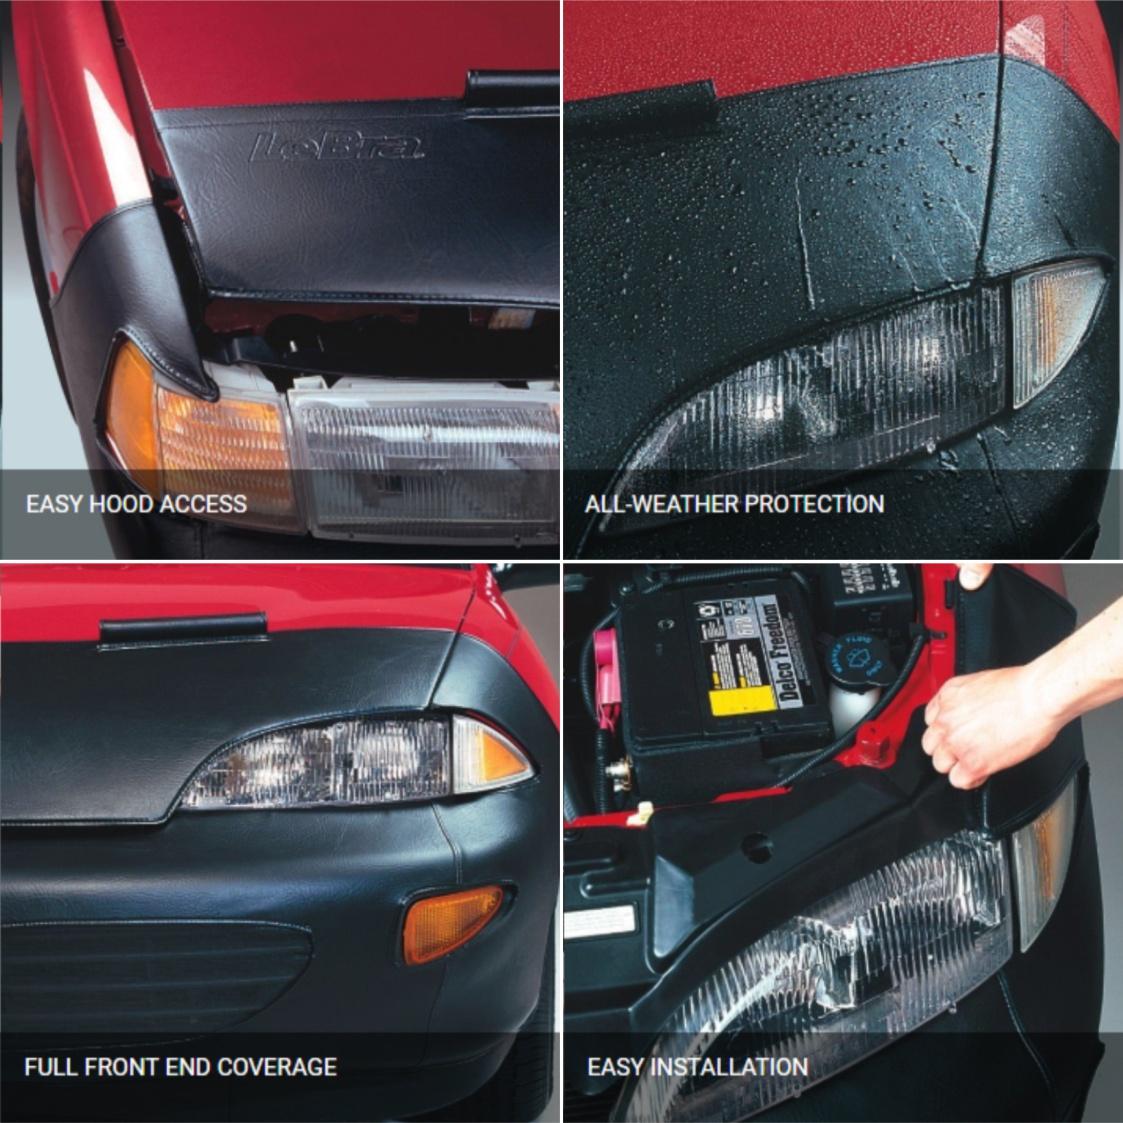 Covercraft LeBra Custom Front End Cover Mask Bra For Subaru 2009-2013 Forester